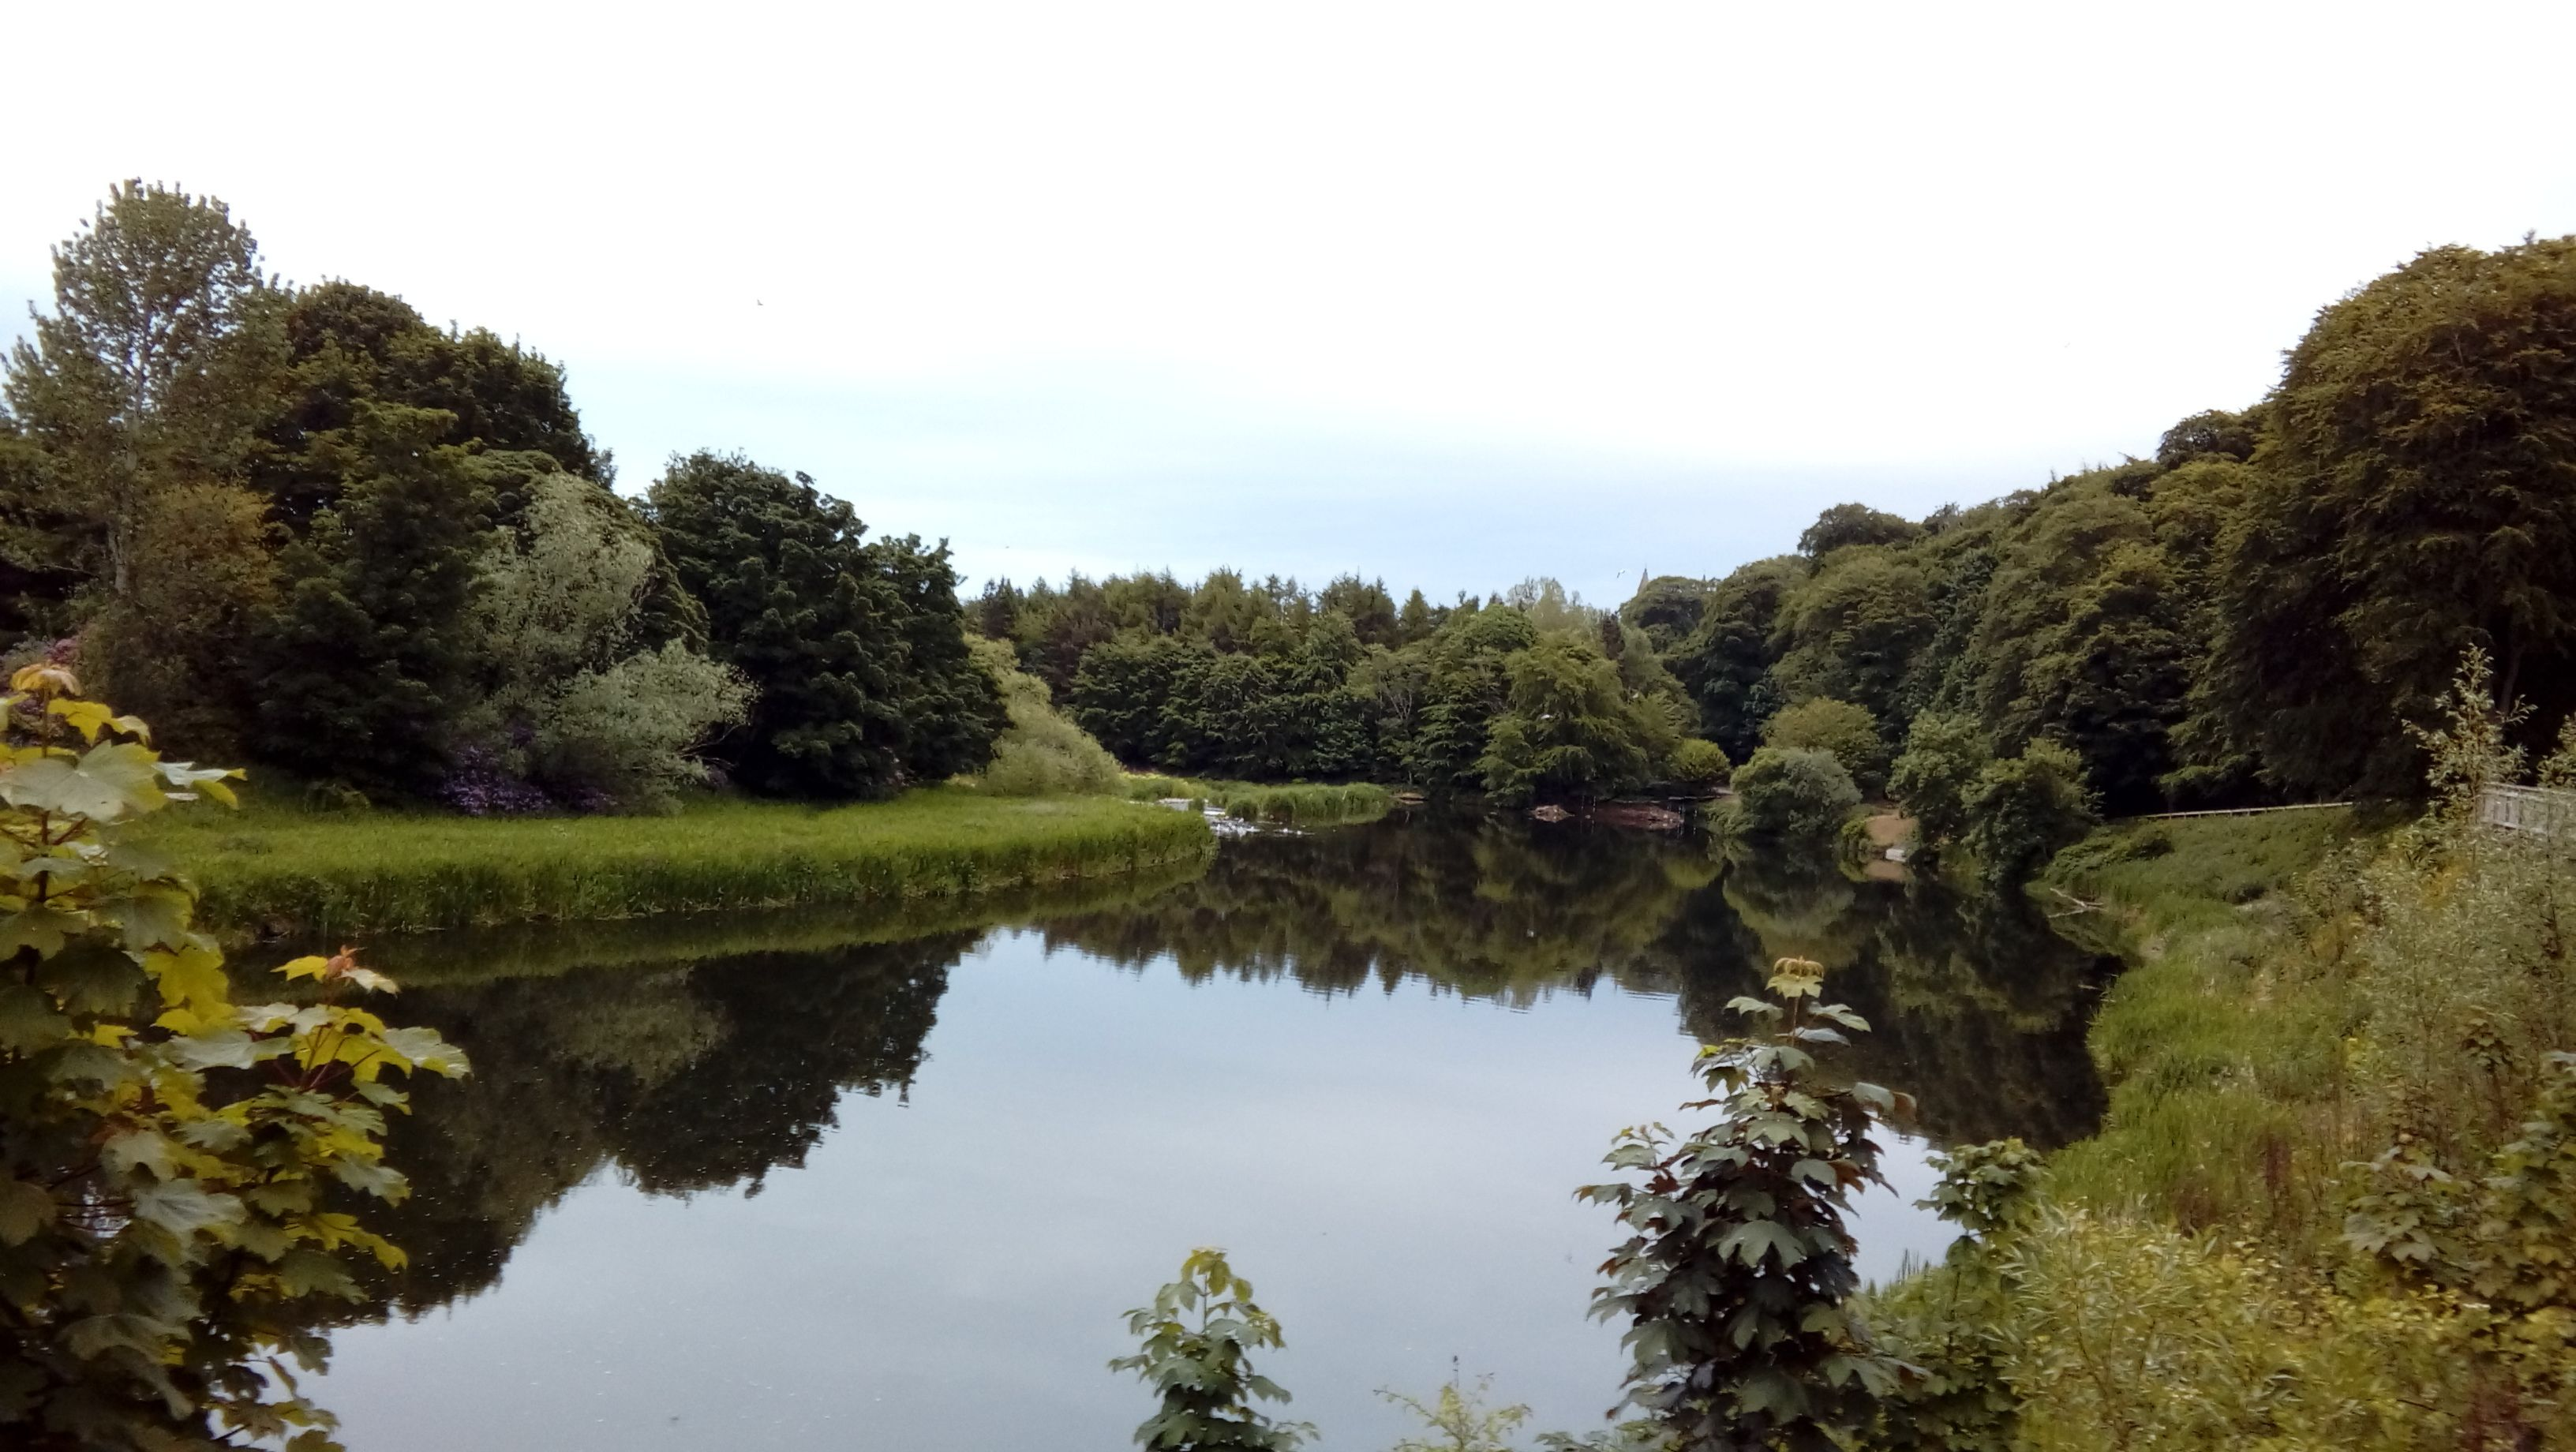 Riverside - unsurfaced paths.